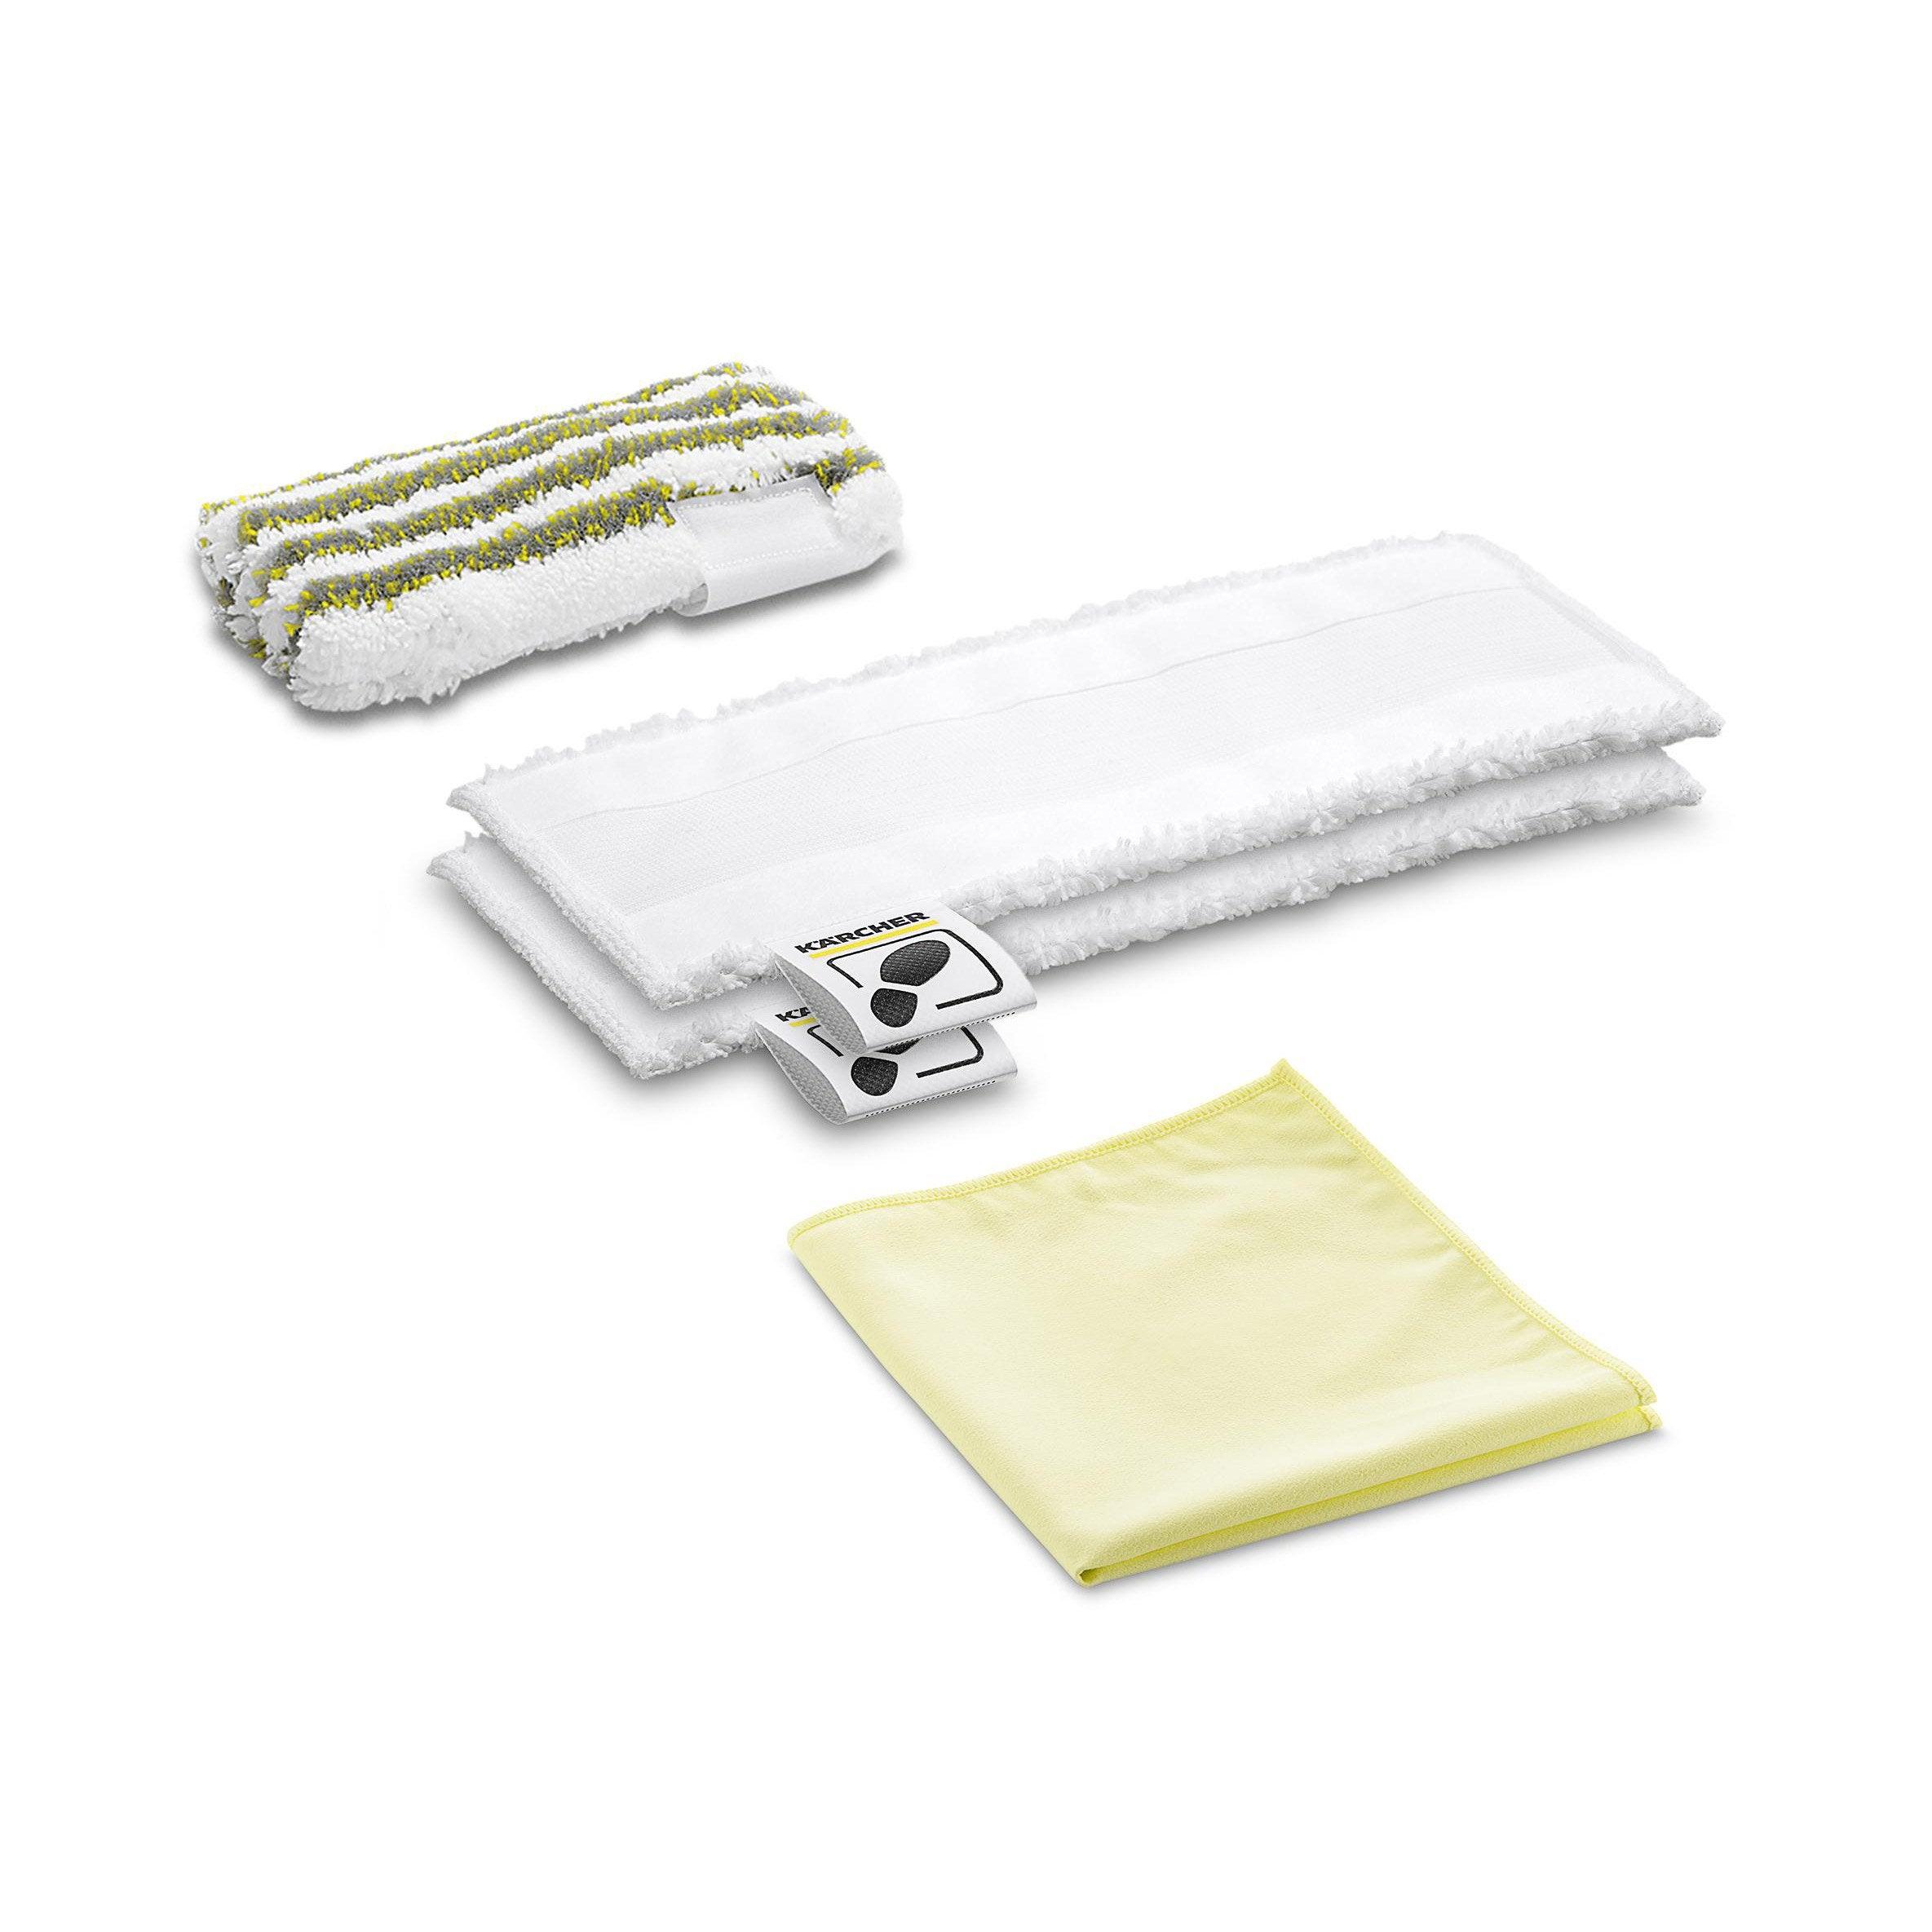 Kit de nettoyage pour nettoyeur vapeur karcher salle de bain leroy merlin - Nettoyage de salle de bain ...